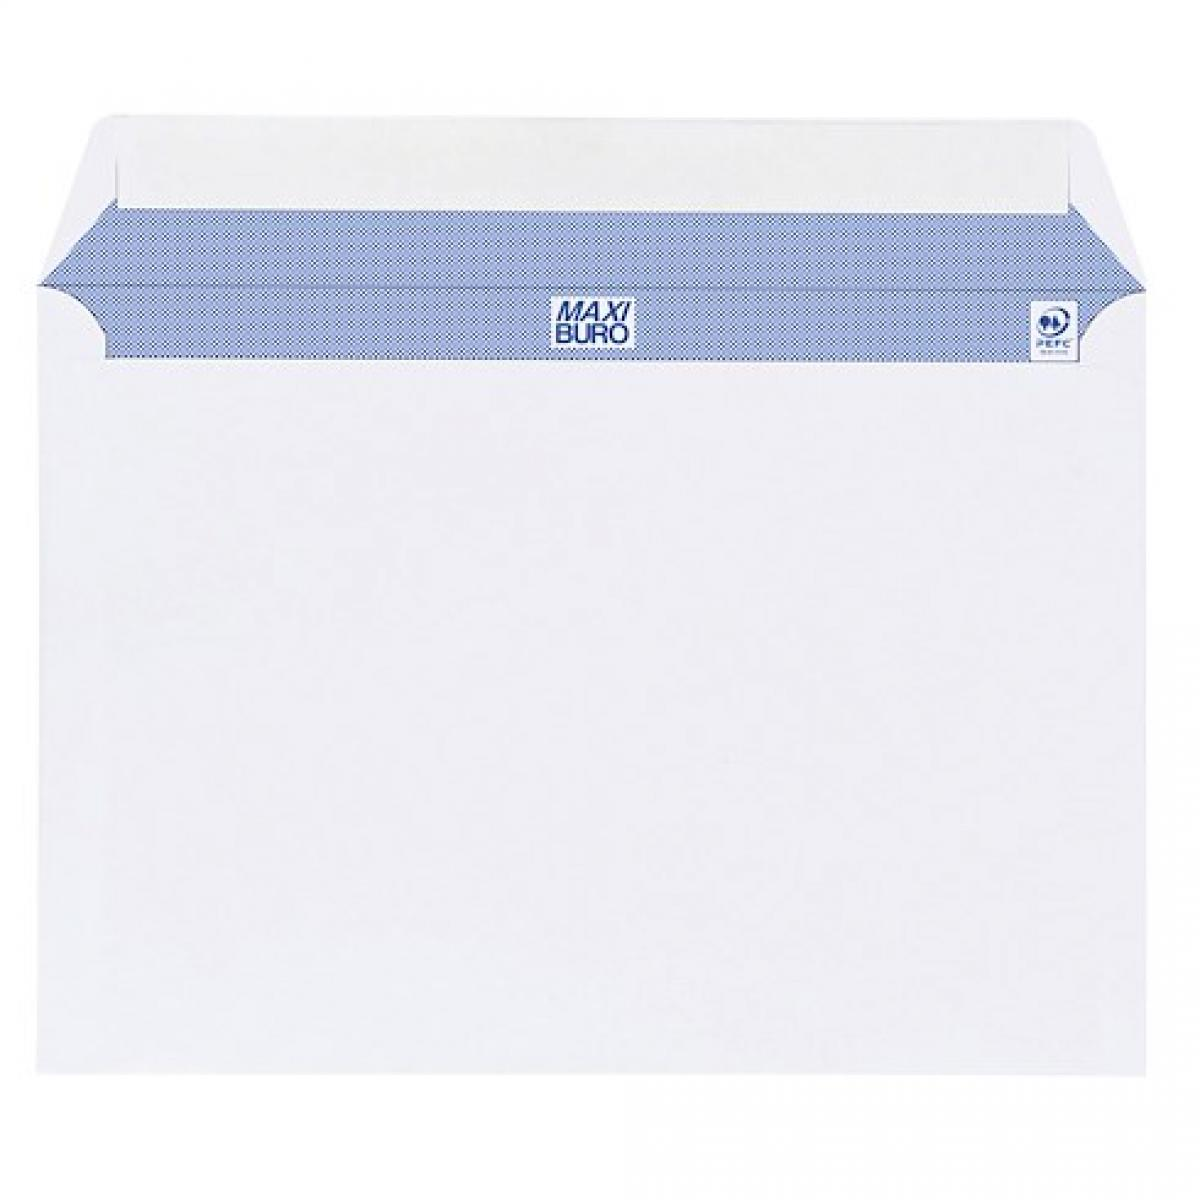 Maxiburo Boite de 500 enveloppes Maxiburo blanches 162x229 mm format C5 avec bande protectrice - avec fenêtre 45 x 100